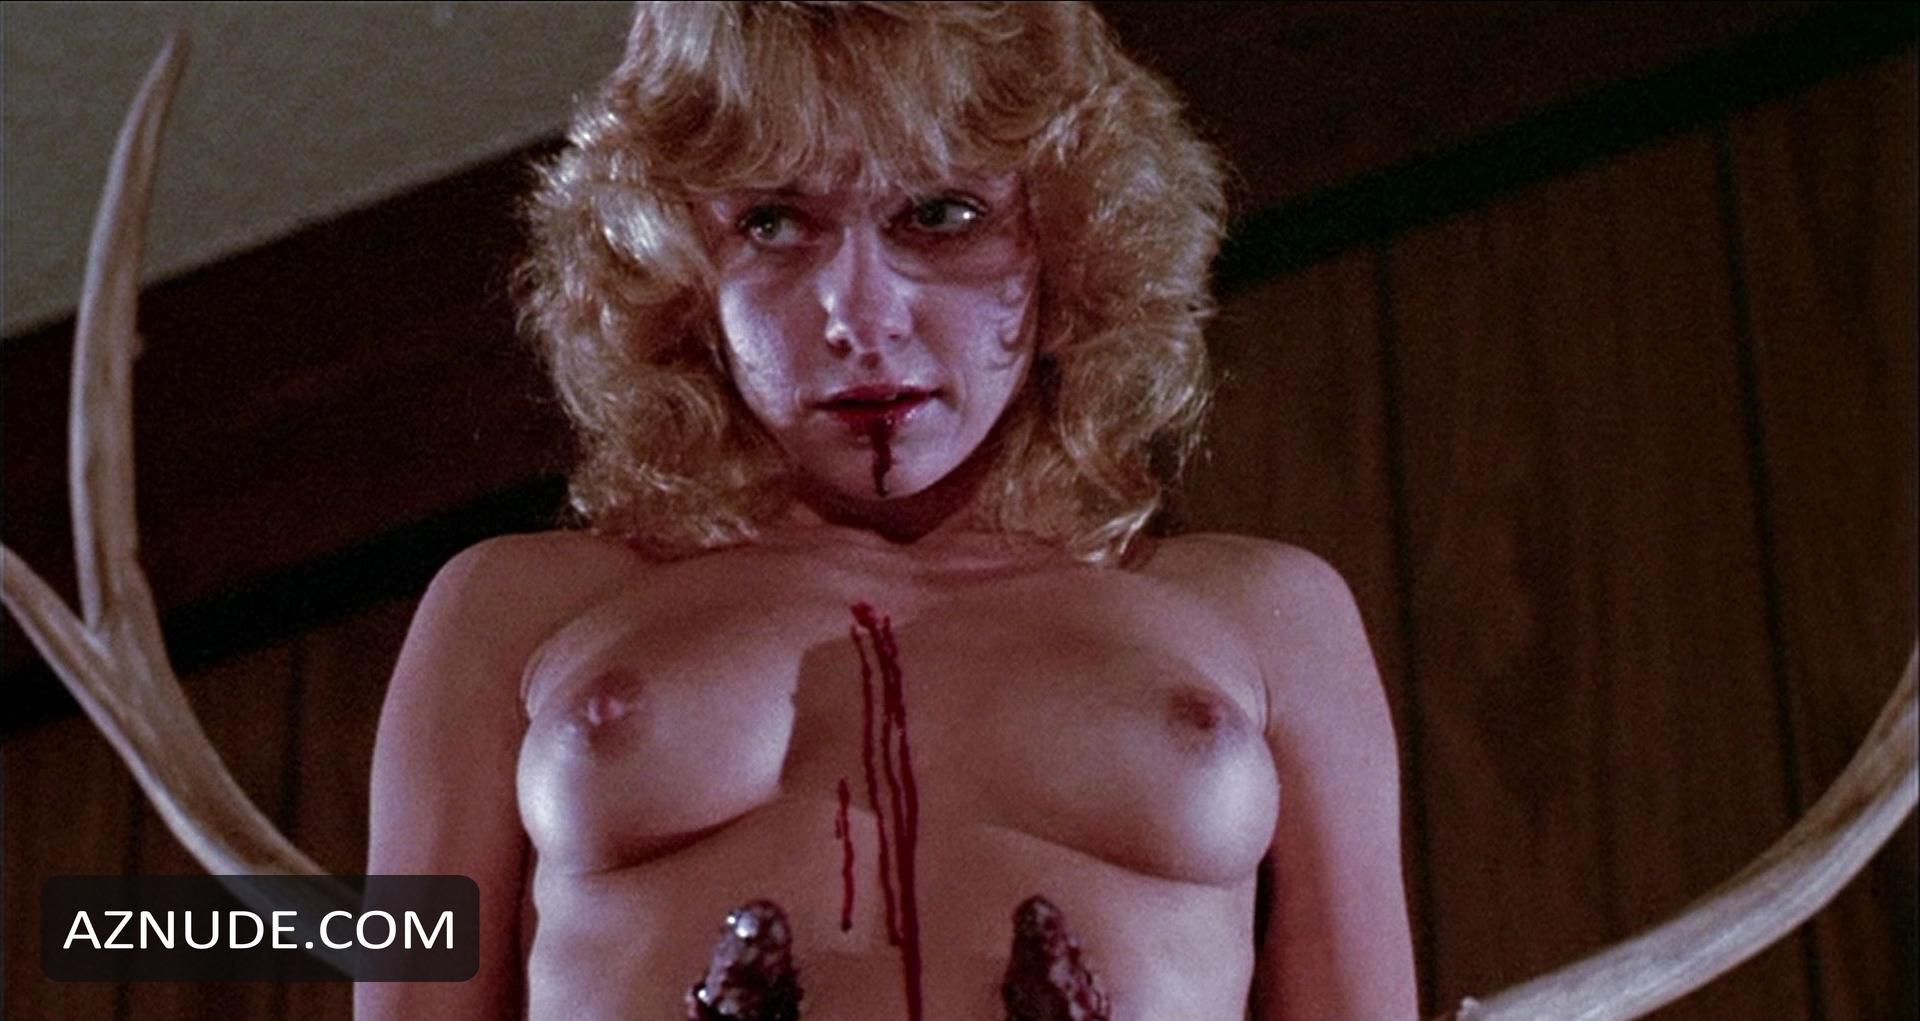 Nicole arbour nude silent but deadly 2010 - 2 part 3